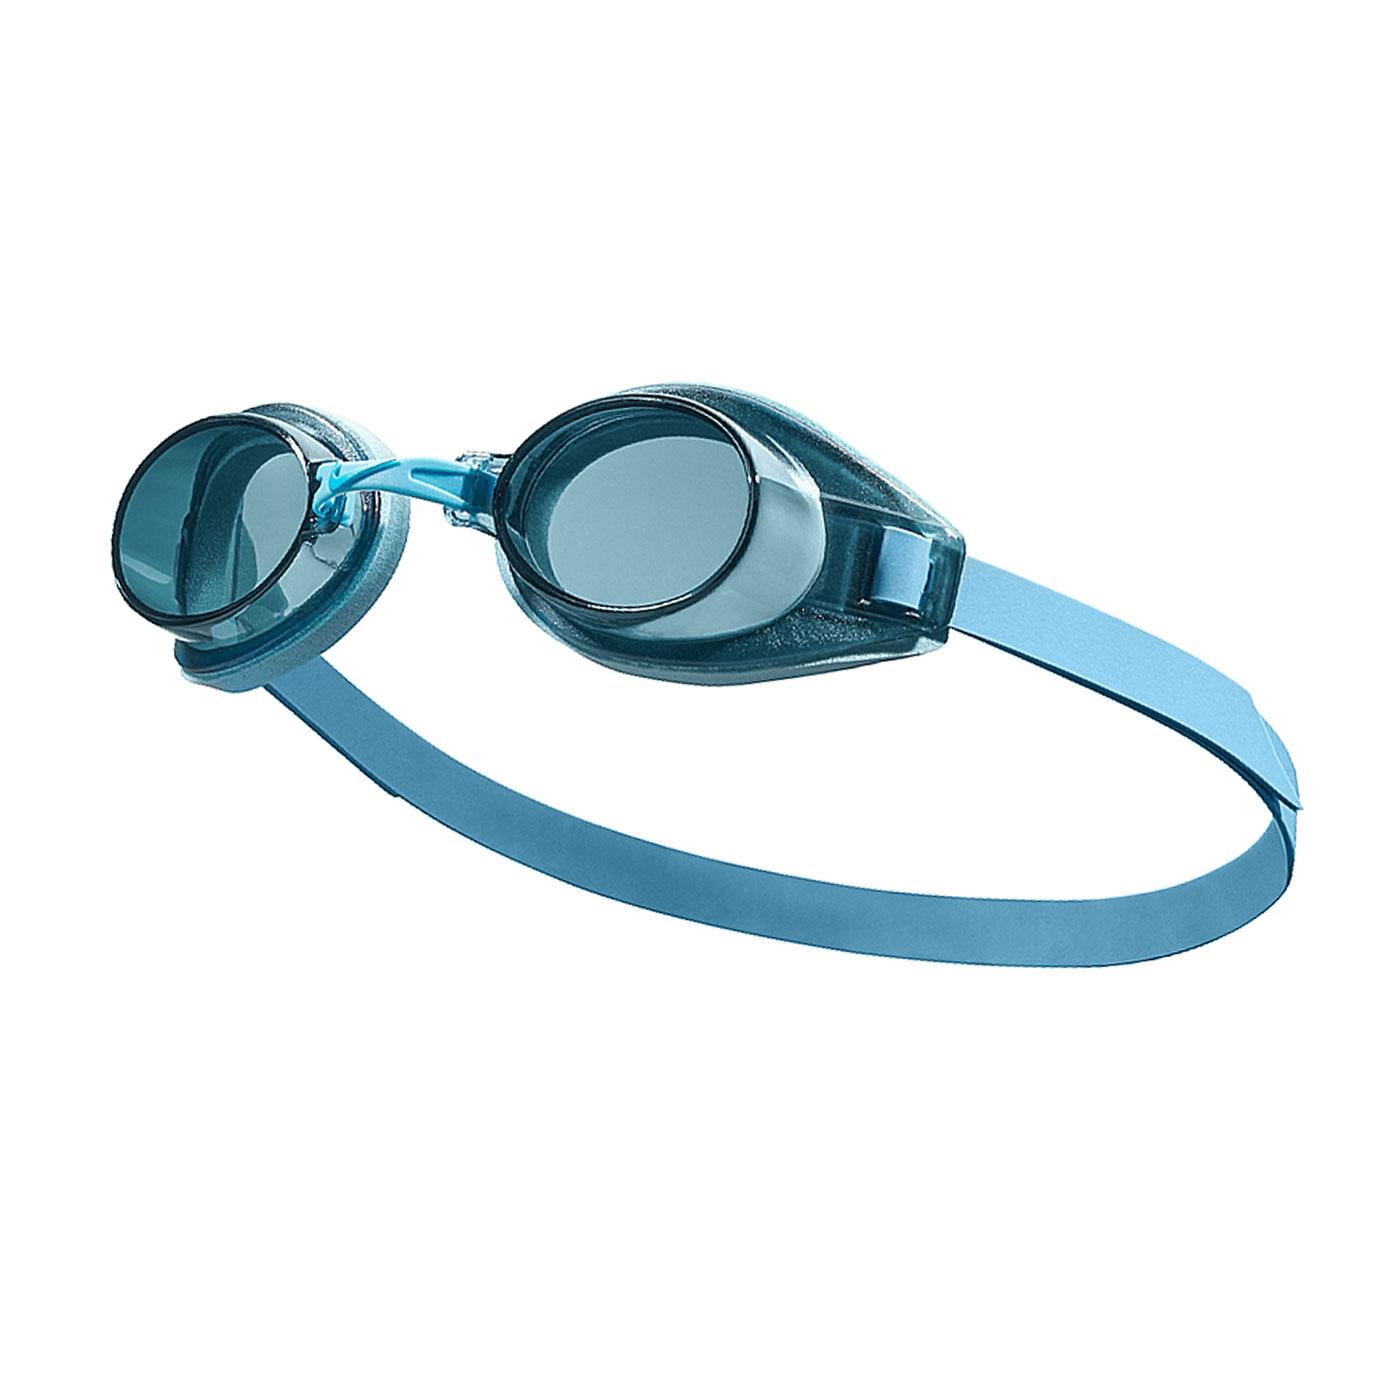 NIKE SWIM 成人休閒型泳鏡 TFSS0555-465 - 藍綠